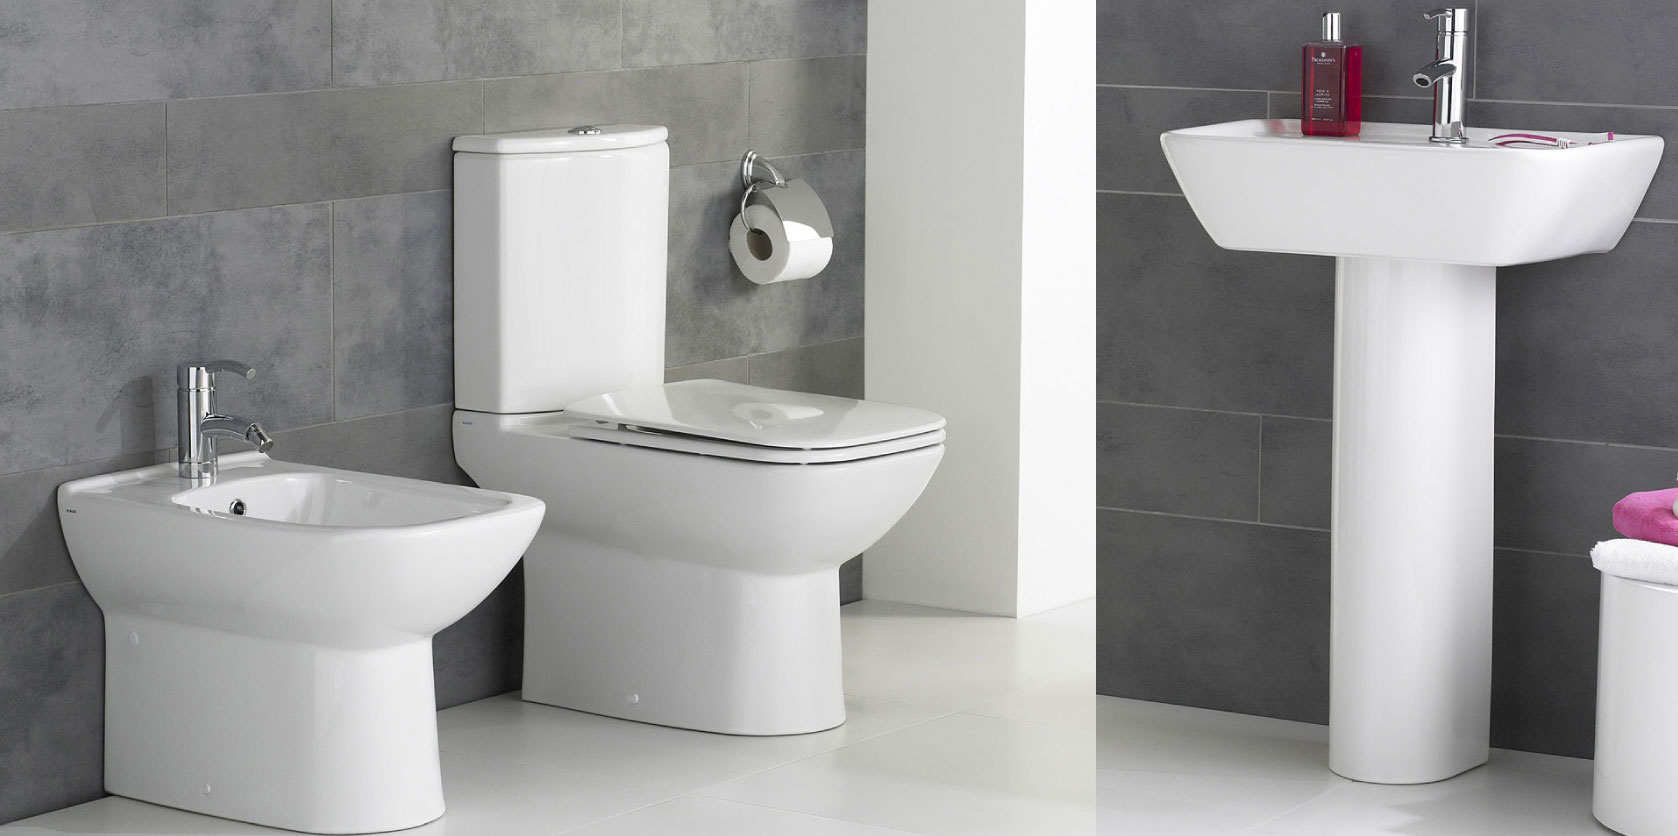 بالصور اطقم حمامات , اجدد تشكيلات اطقم الحمامات 950 5